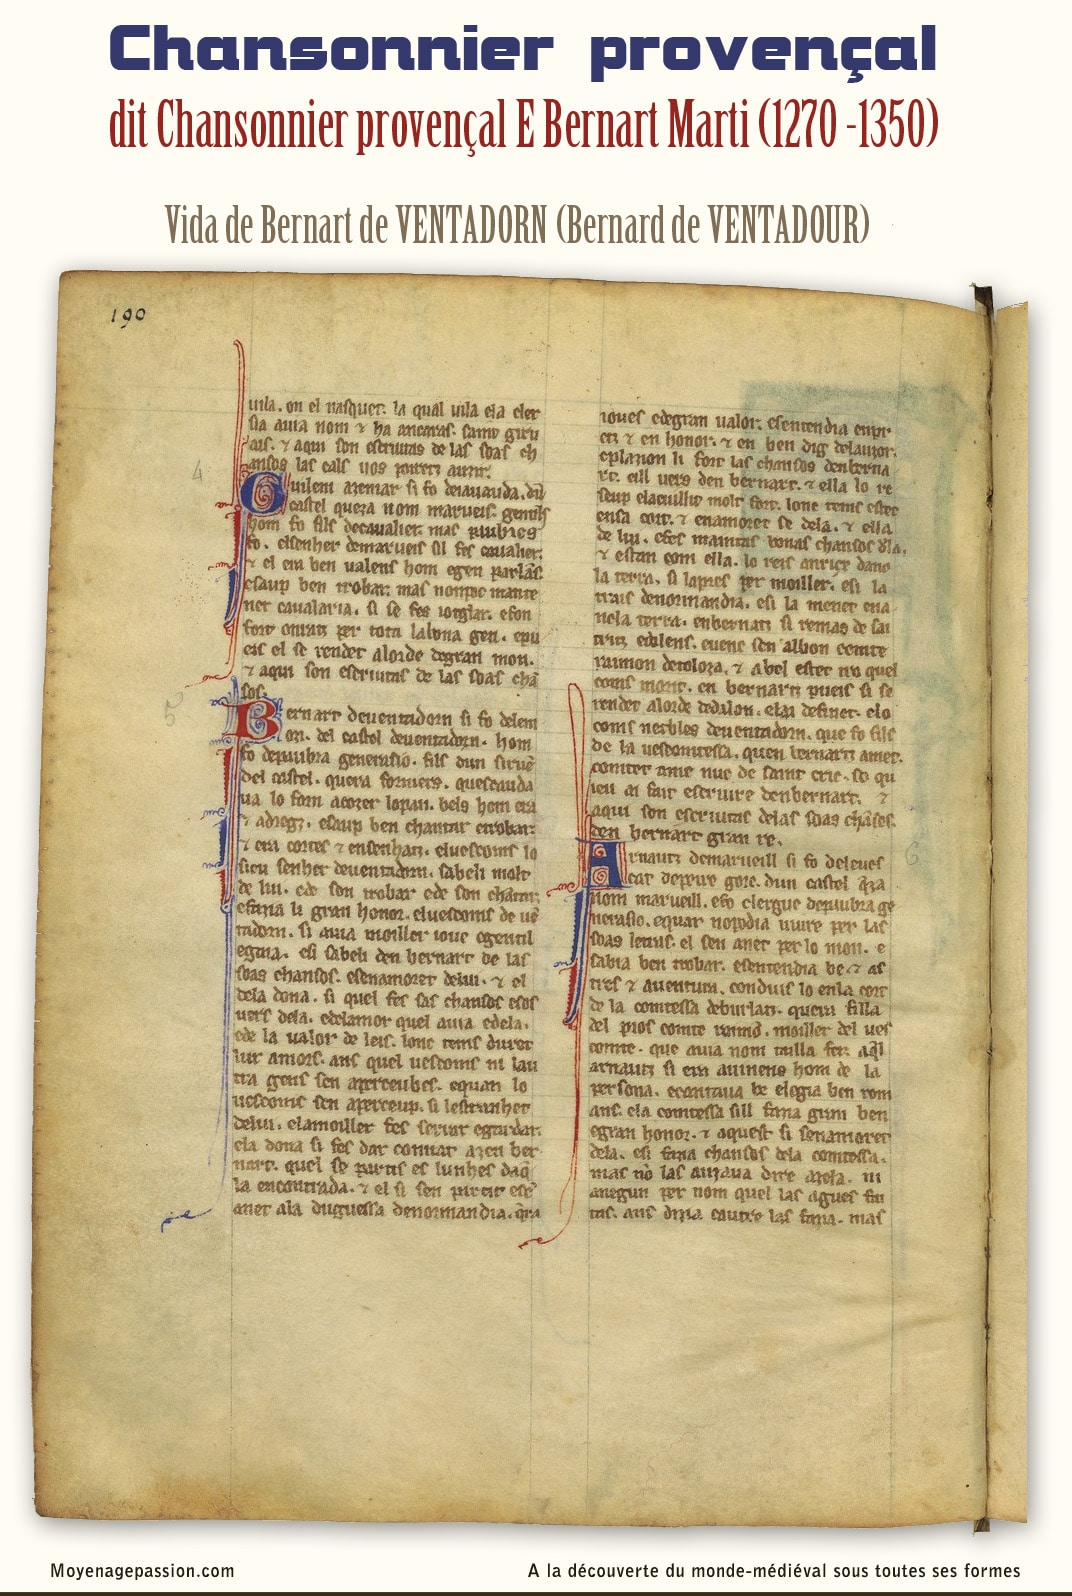 troubadour_occitan_chansonnier_provencal_bernart_de_ventadorn_bernard_vendatour_manuscrit_ancien